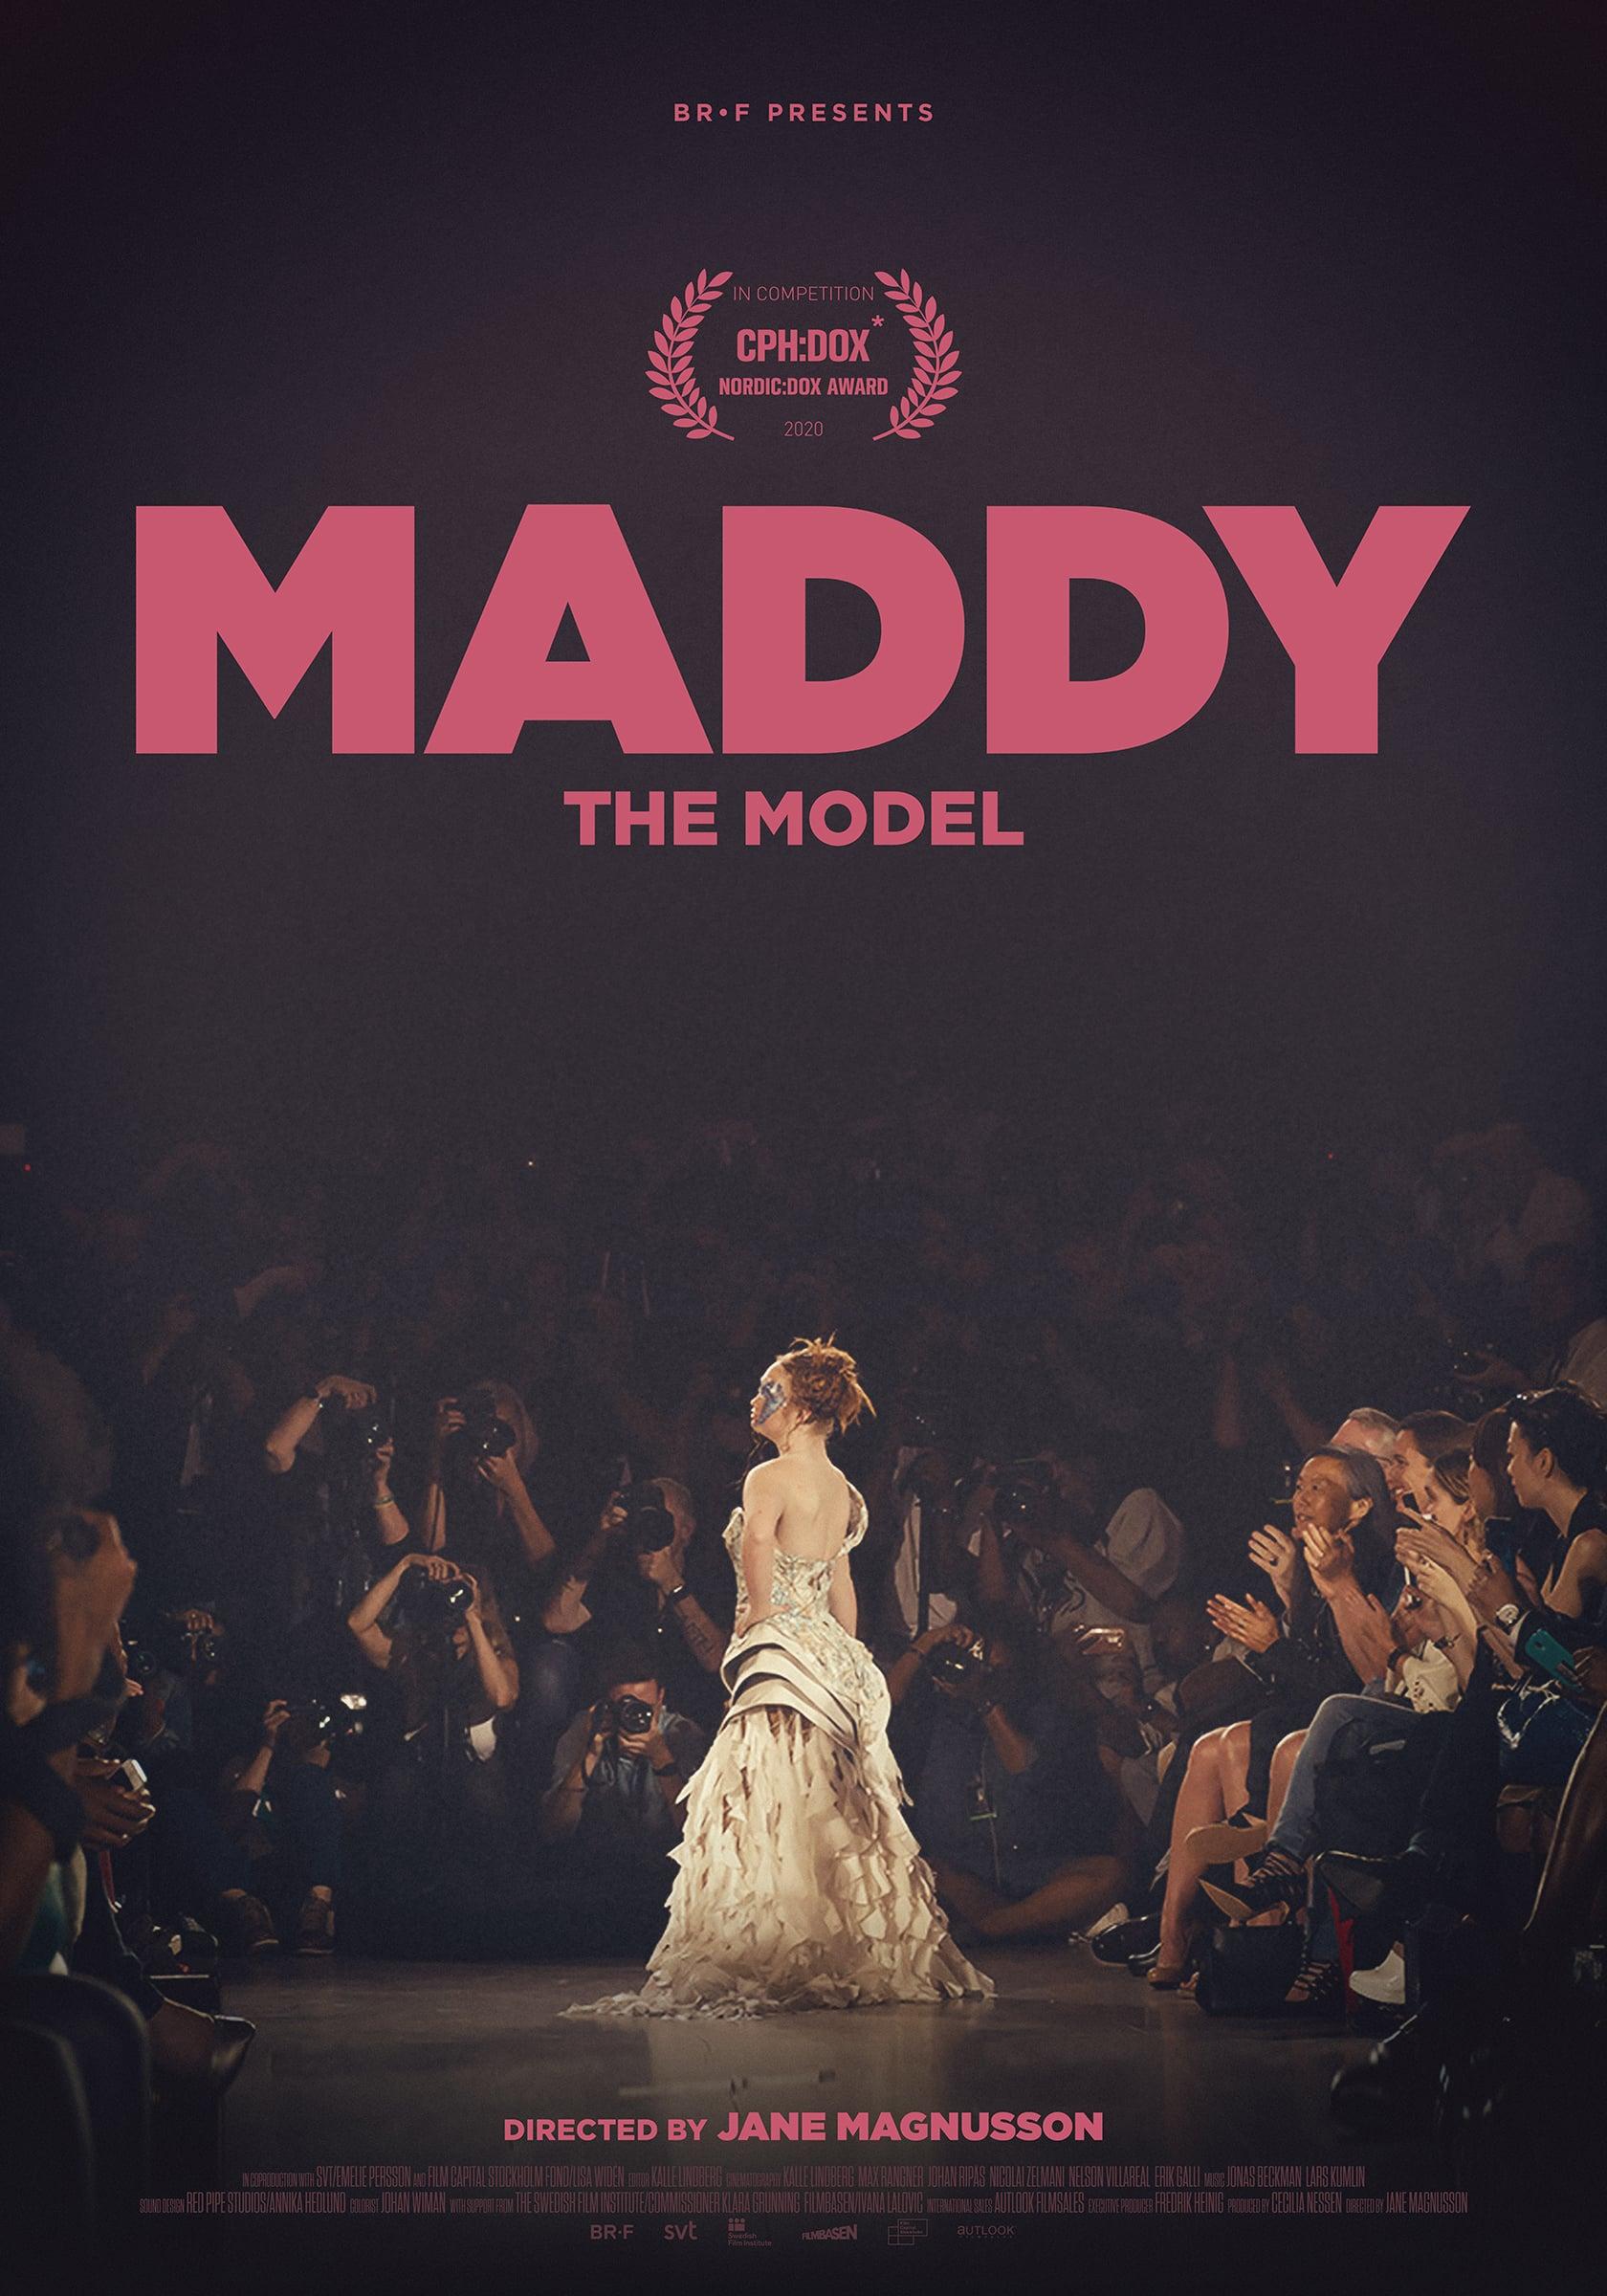 Regarder Maddy en streaming gratuit